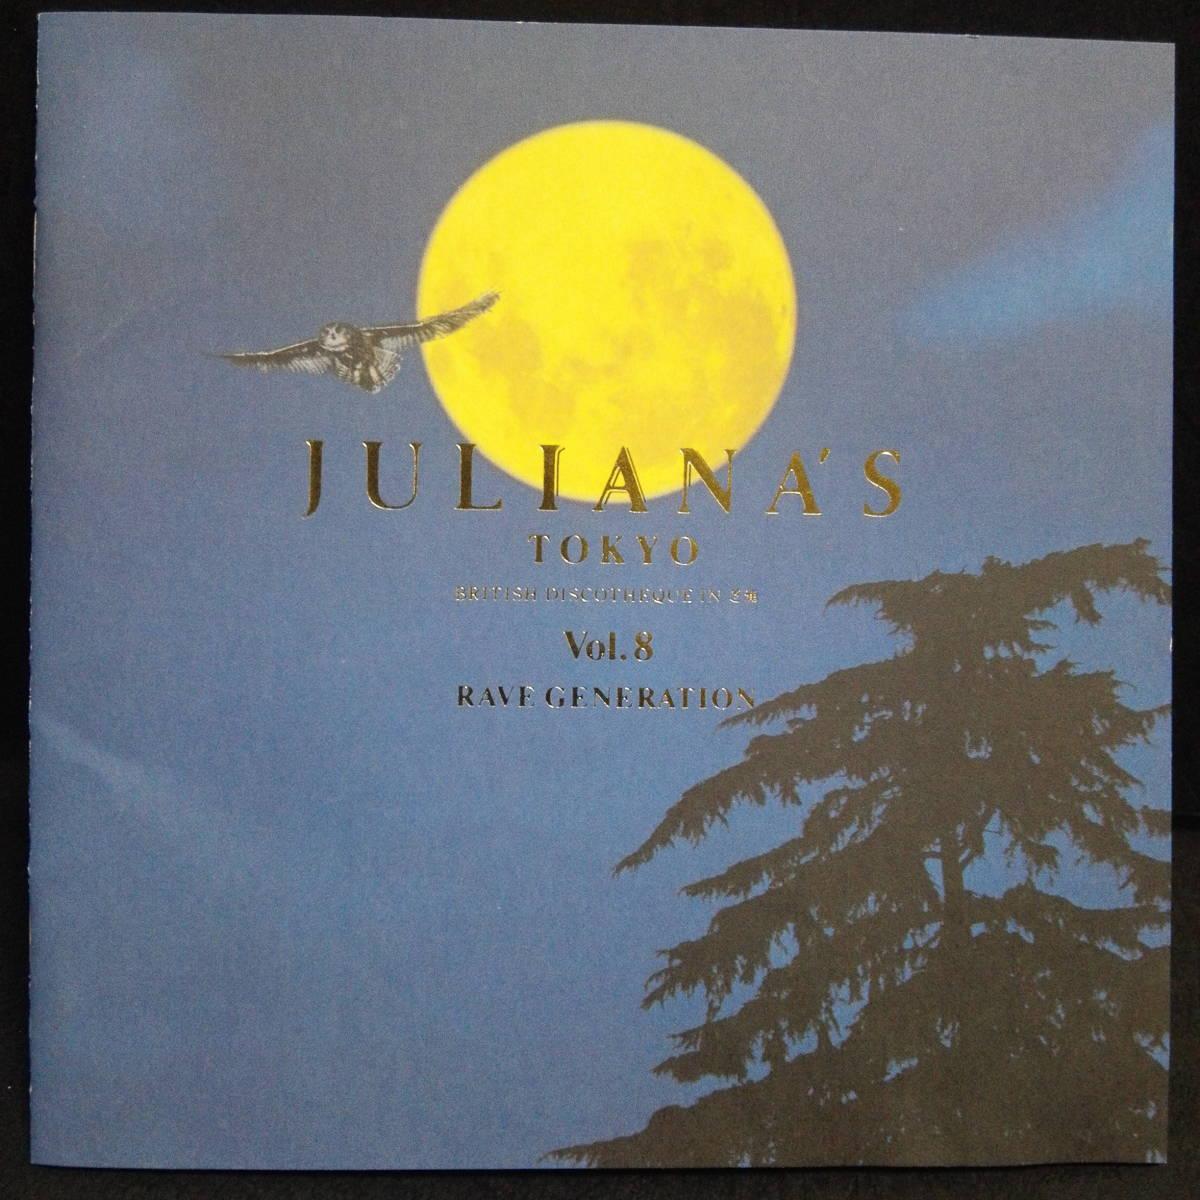 JULIANA'S TOKYO Vol.8 ジュリアナ 東京 90s ディスコ DISCO ジョンロビンソン John Robinson 2ND FUNK-TION L.A.STYLE RAVEMAN Fargetta_画像5